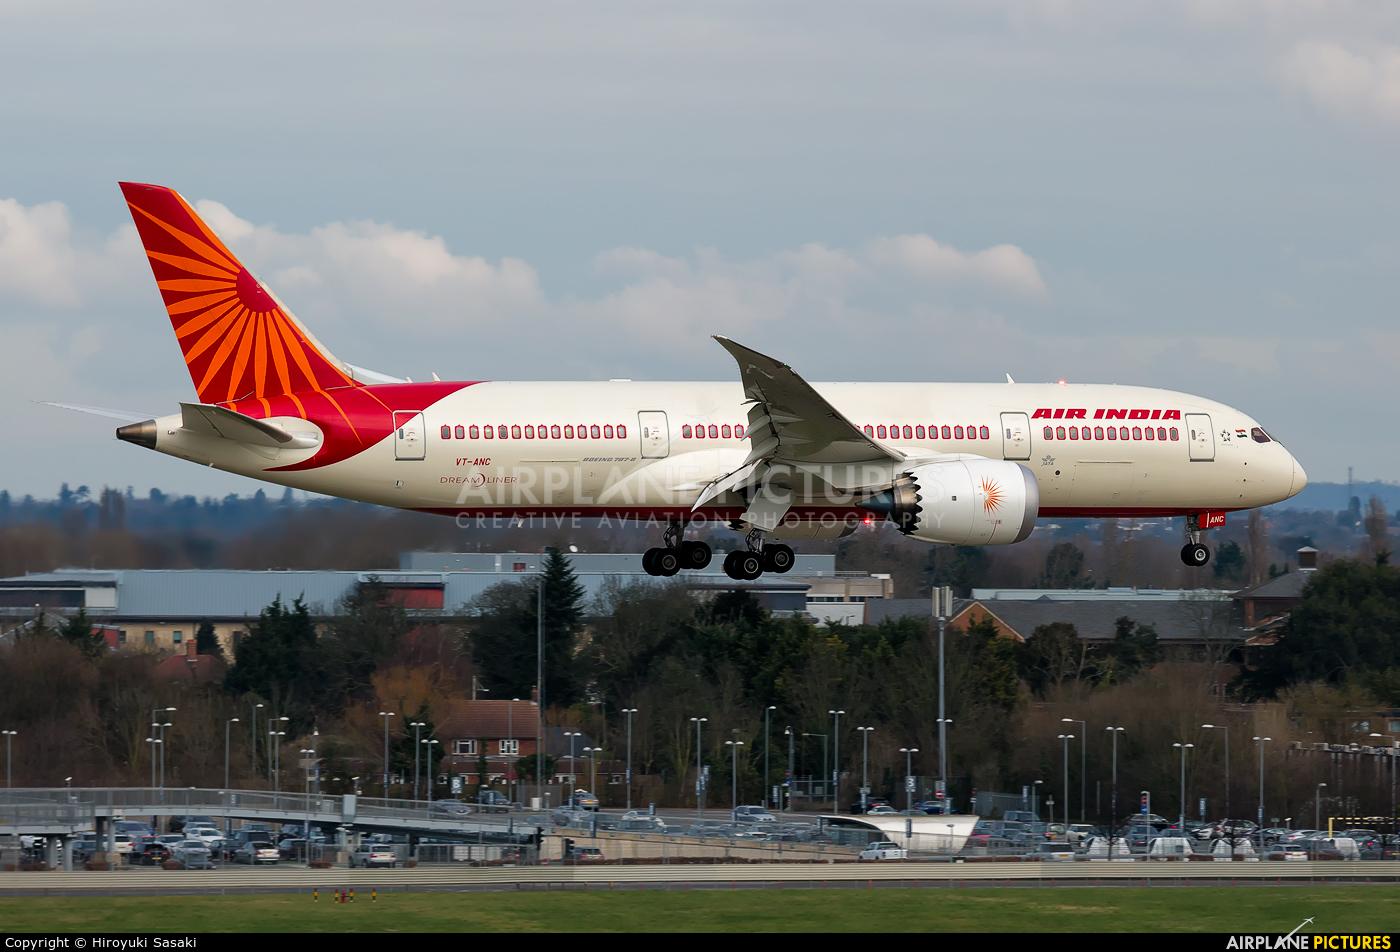 Air India VT-ANC aircraft at London - Heathrow